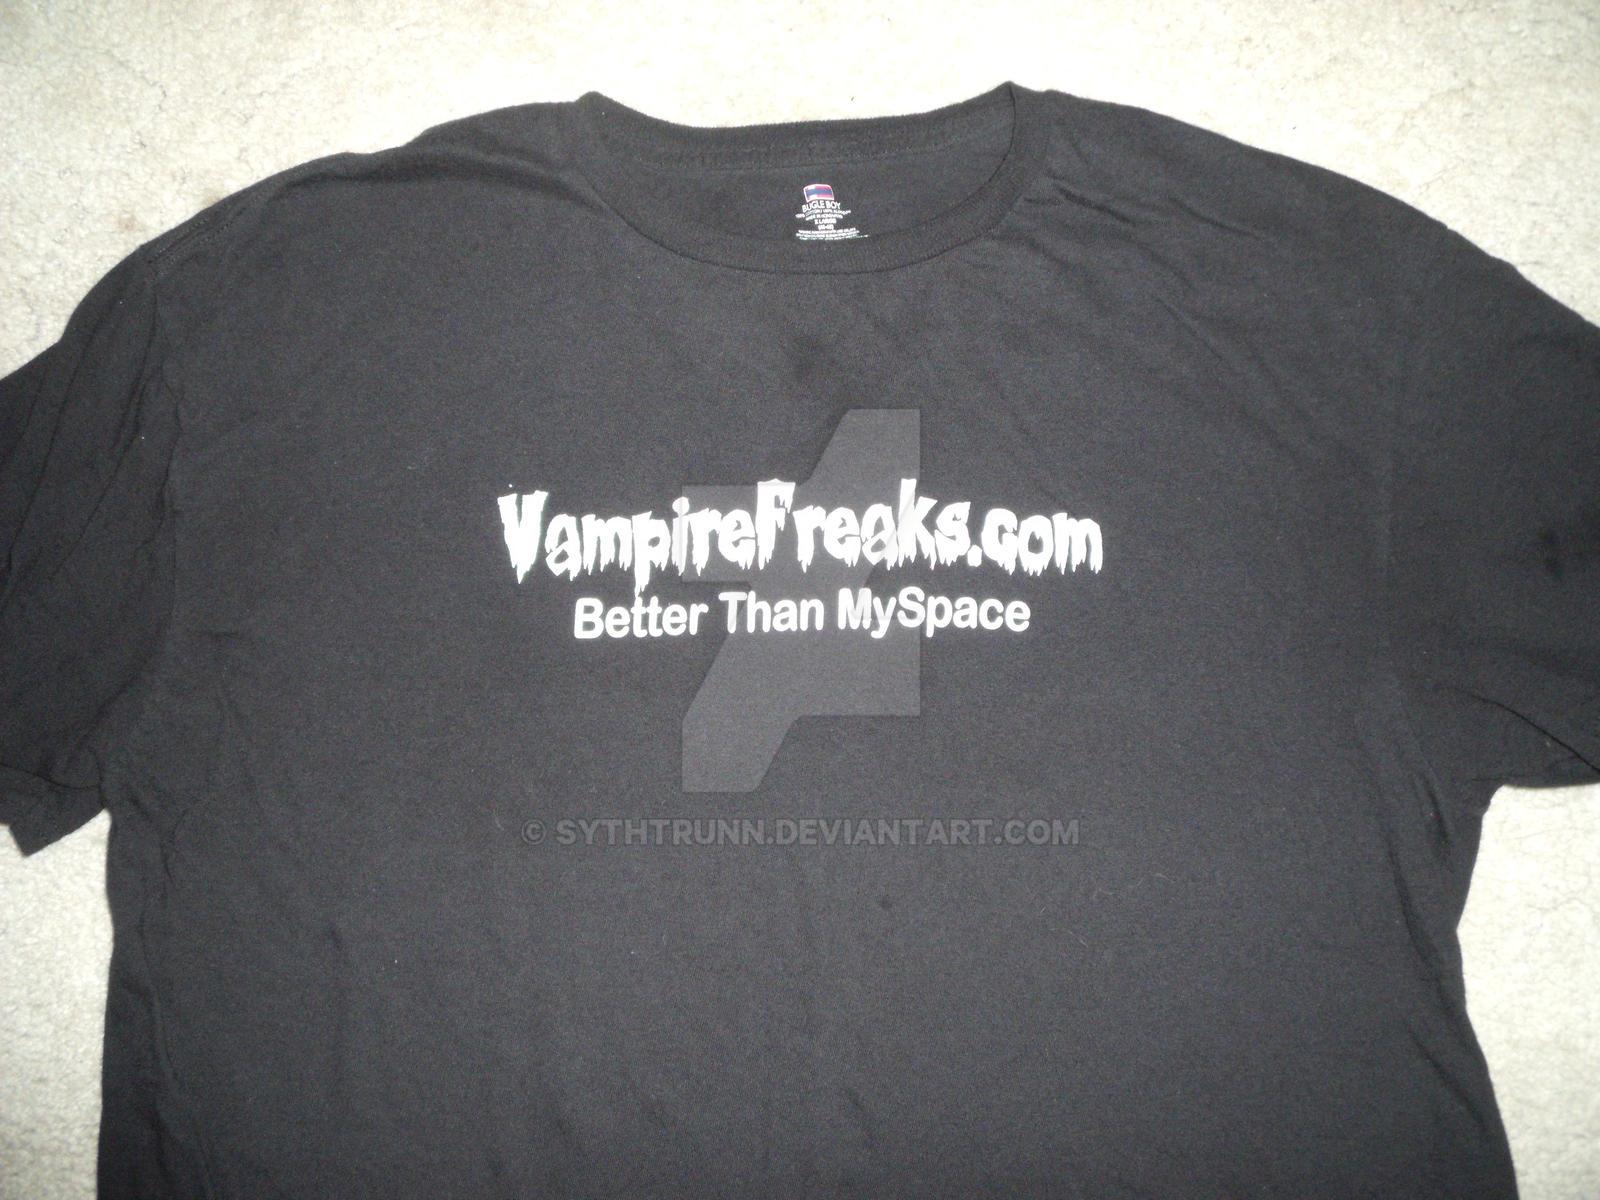 is vampirefreaks a dating site